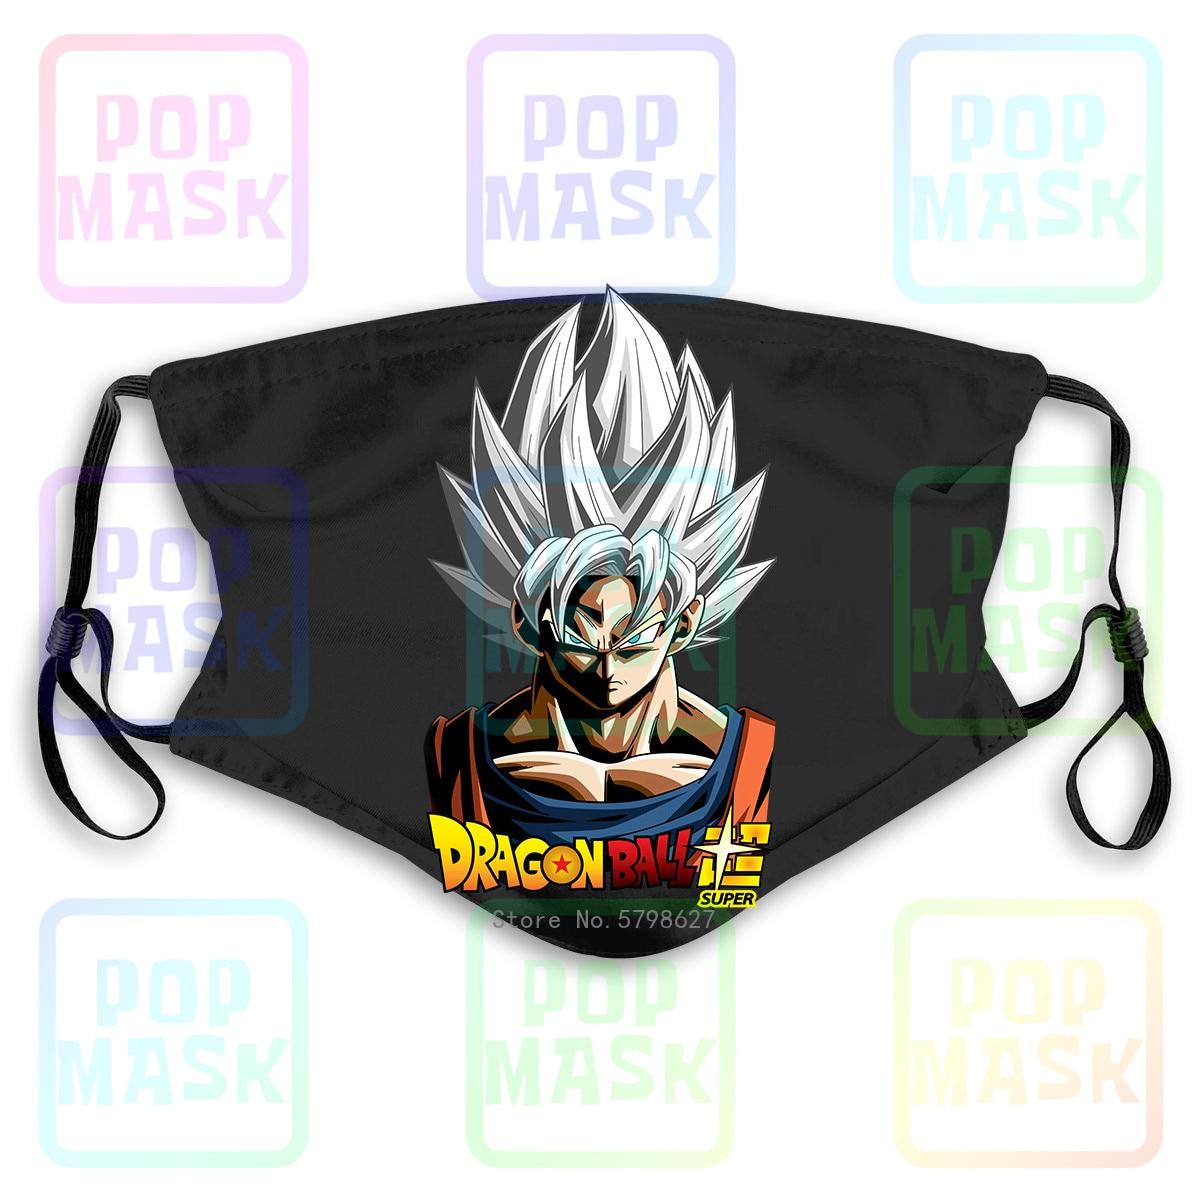 Dragon Ball Super Goku Ultra Instinct Saiyan Washable Reusable Mask With 2Pcs PM2.5 Filters 5 Layers